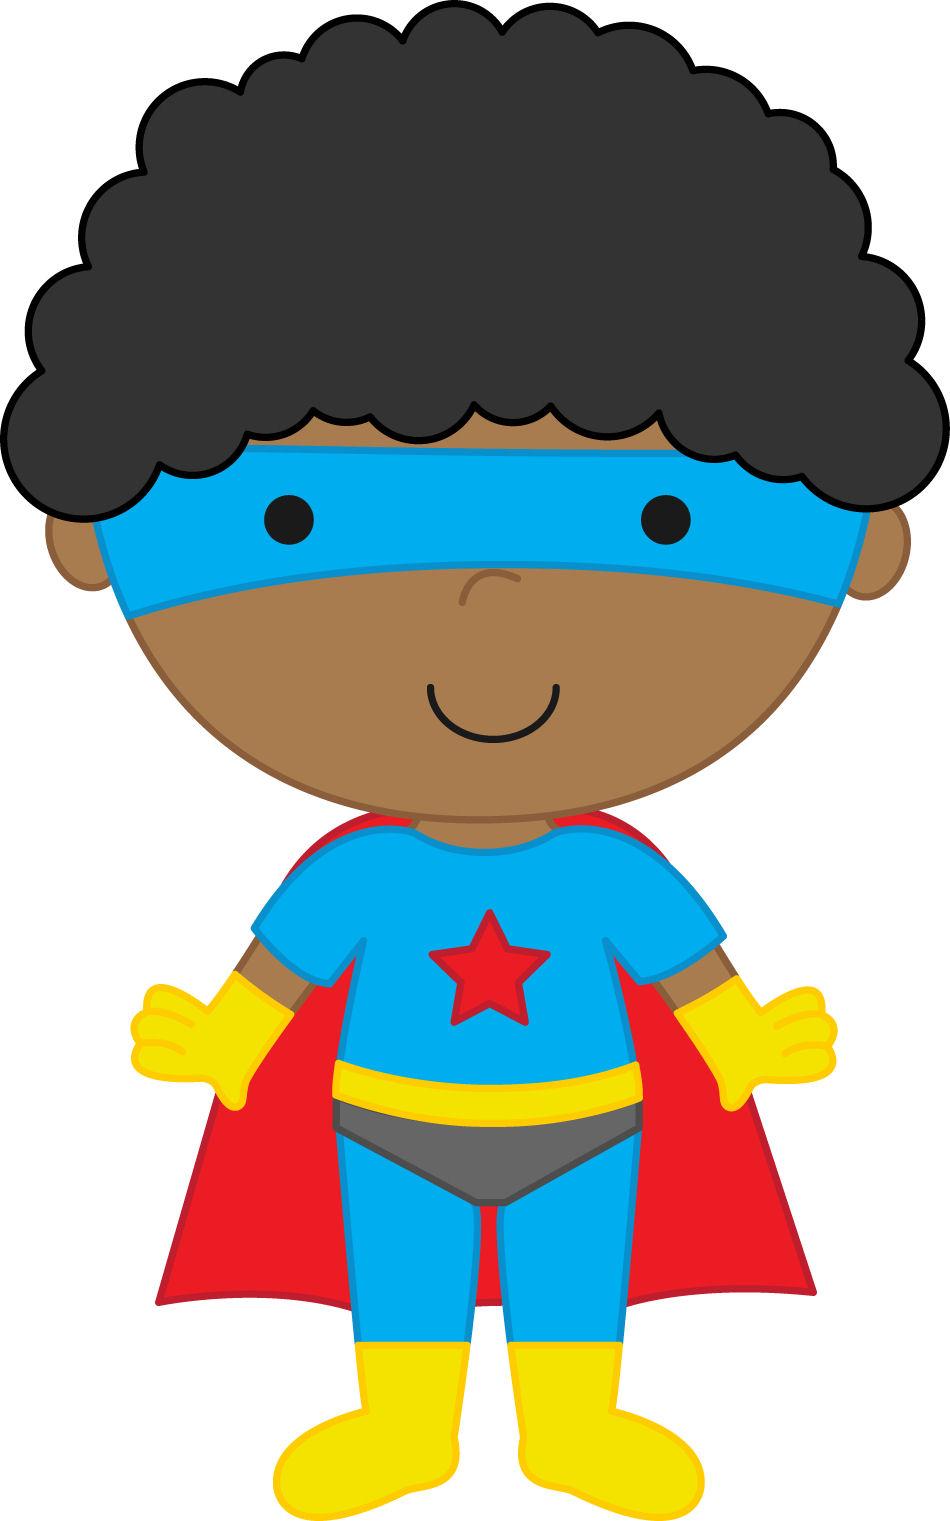 Super hero kid clipart 2 » Clipart Station.